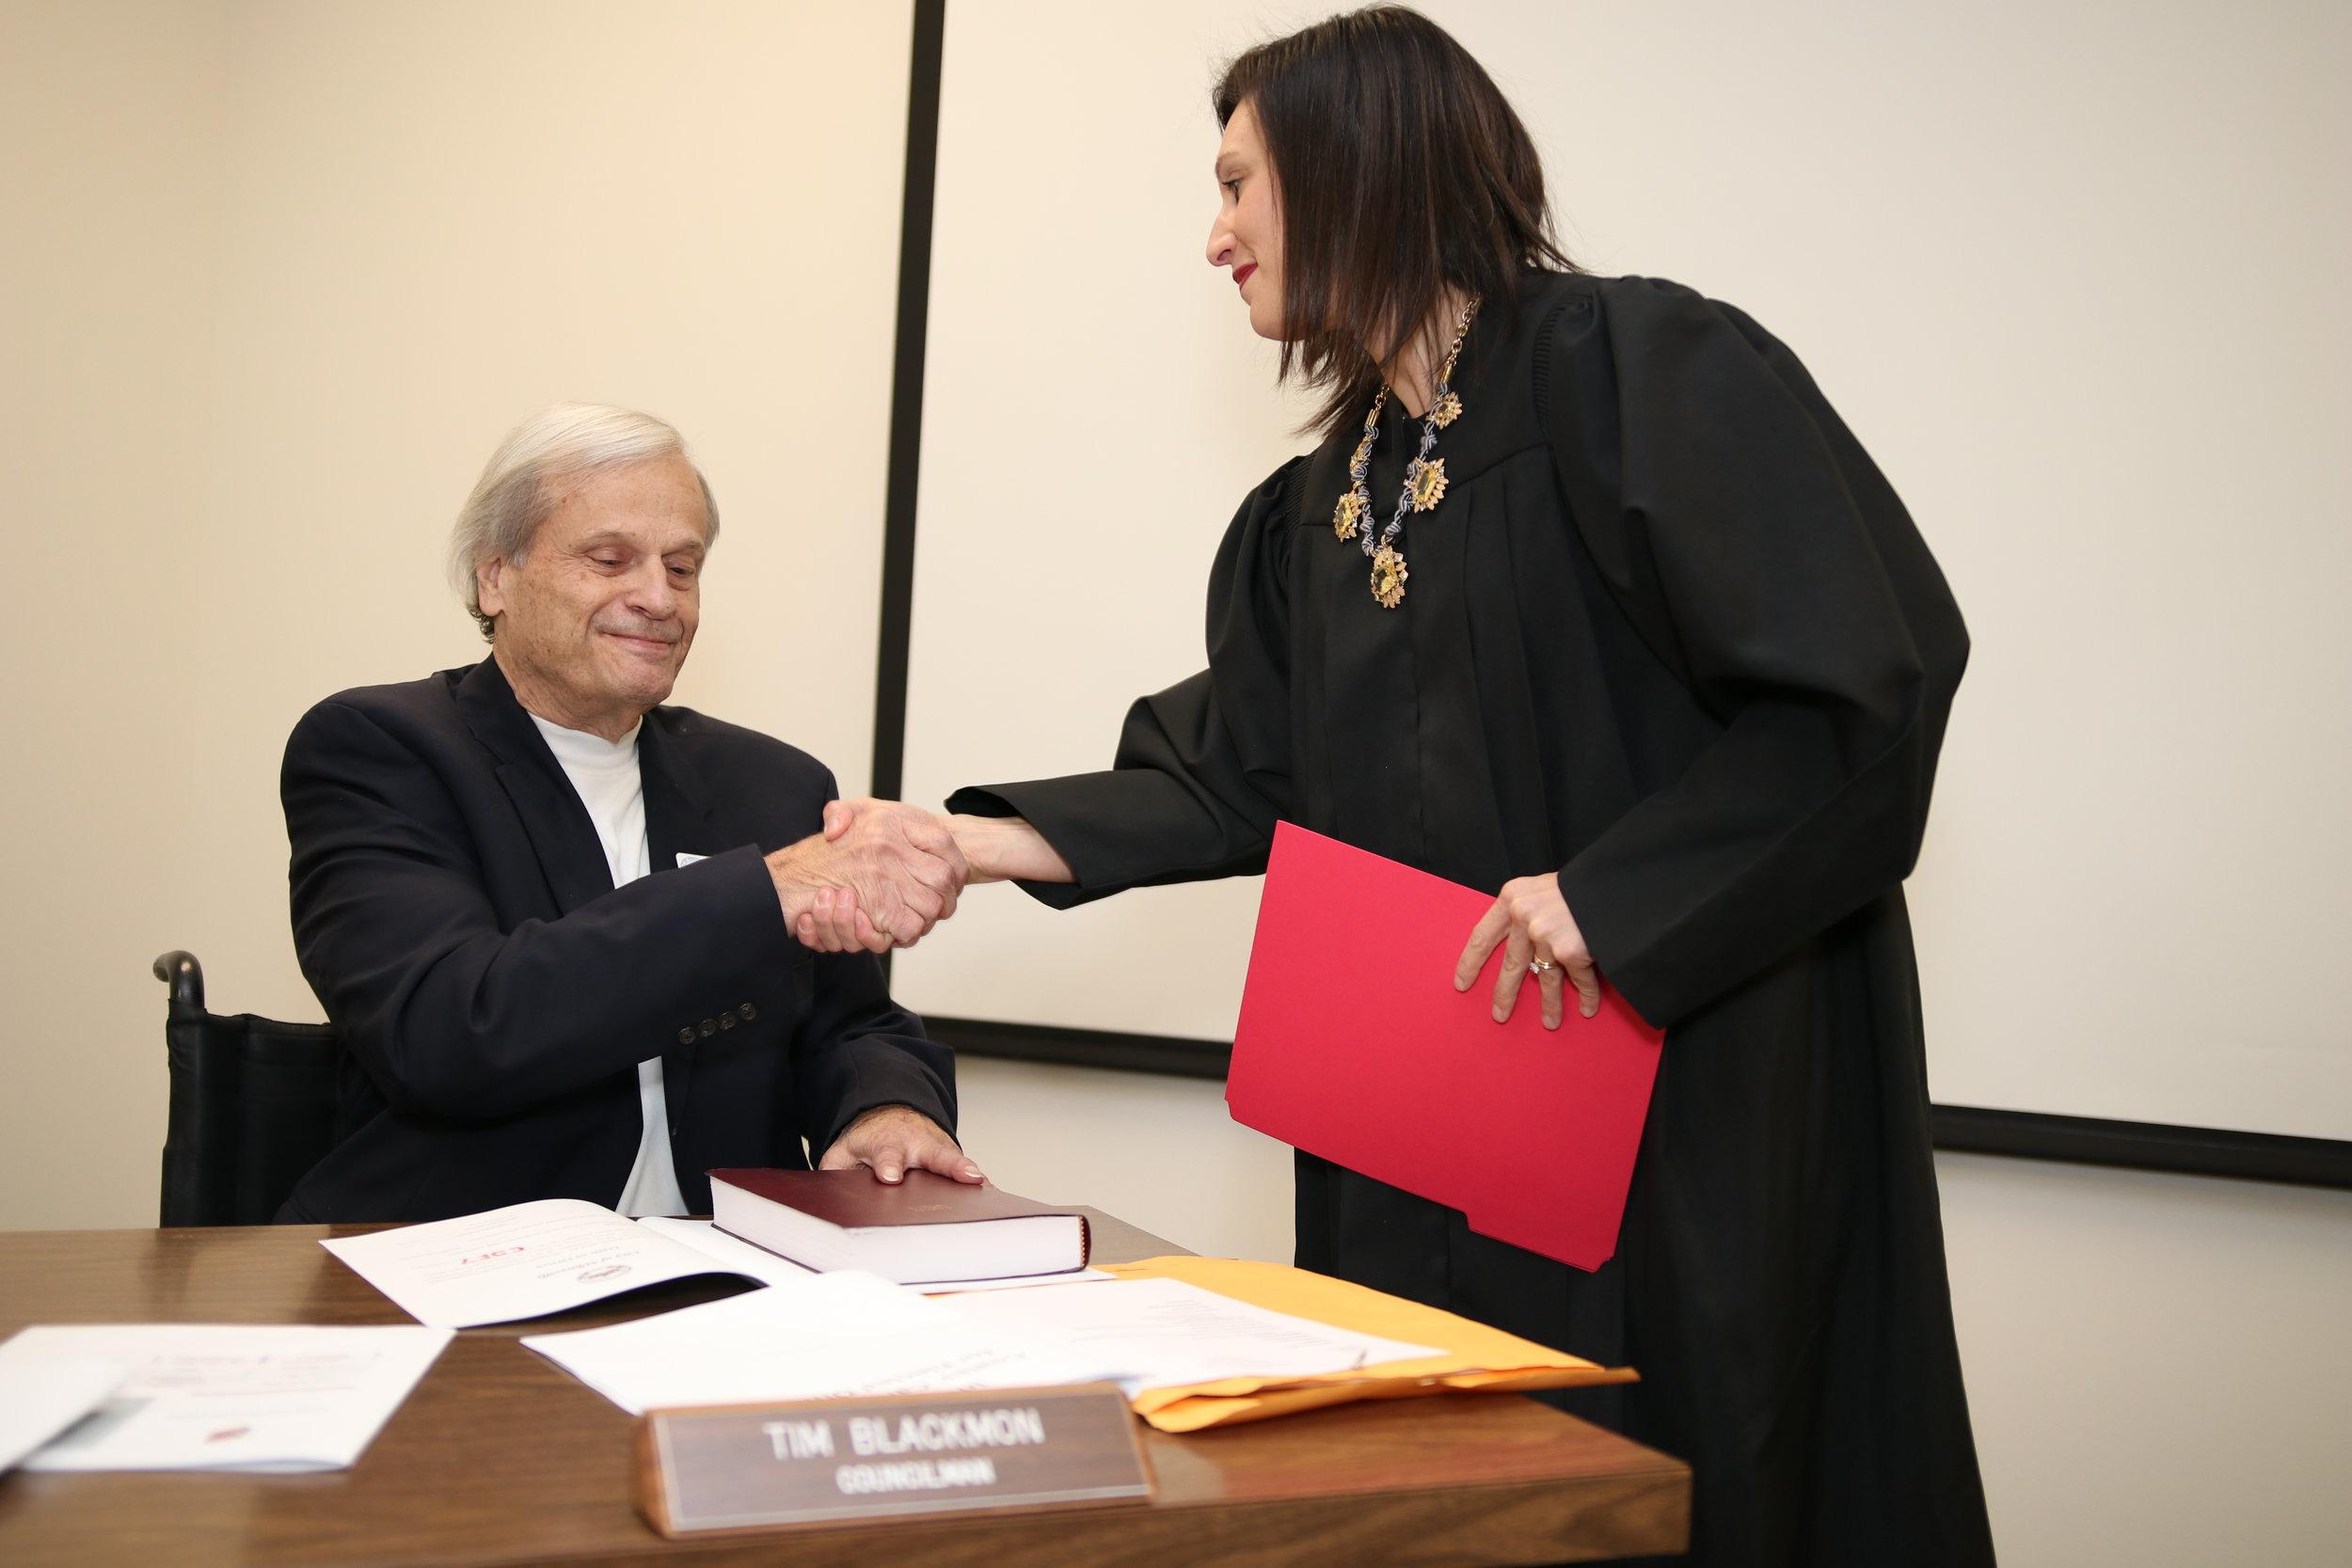 Tim Blackmon is sworn in by judge Ashley Gore.